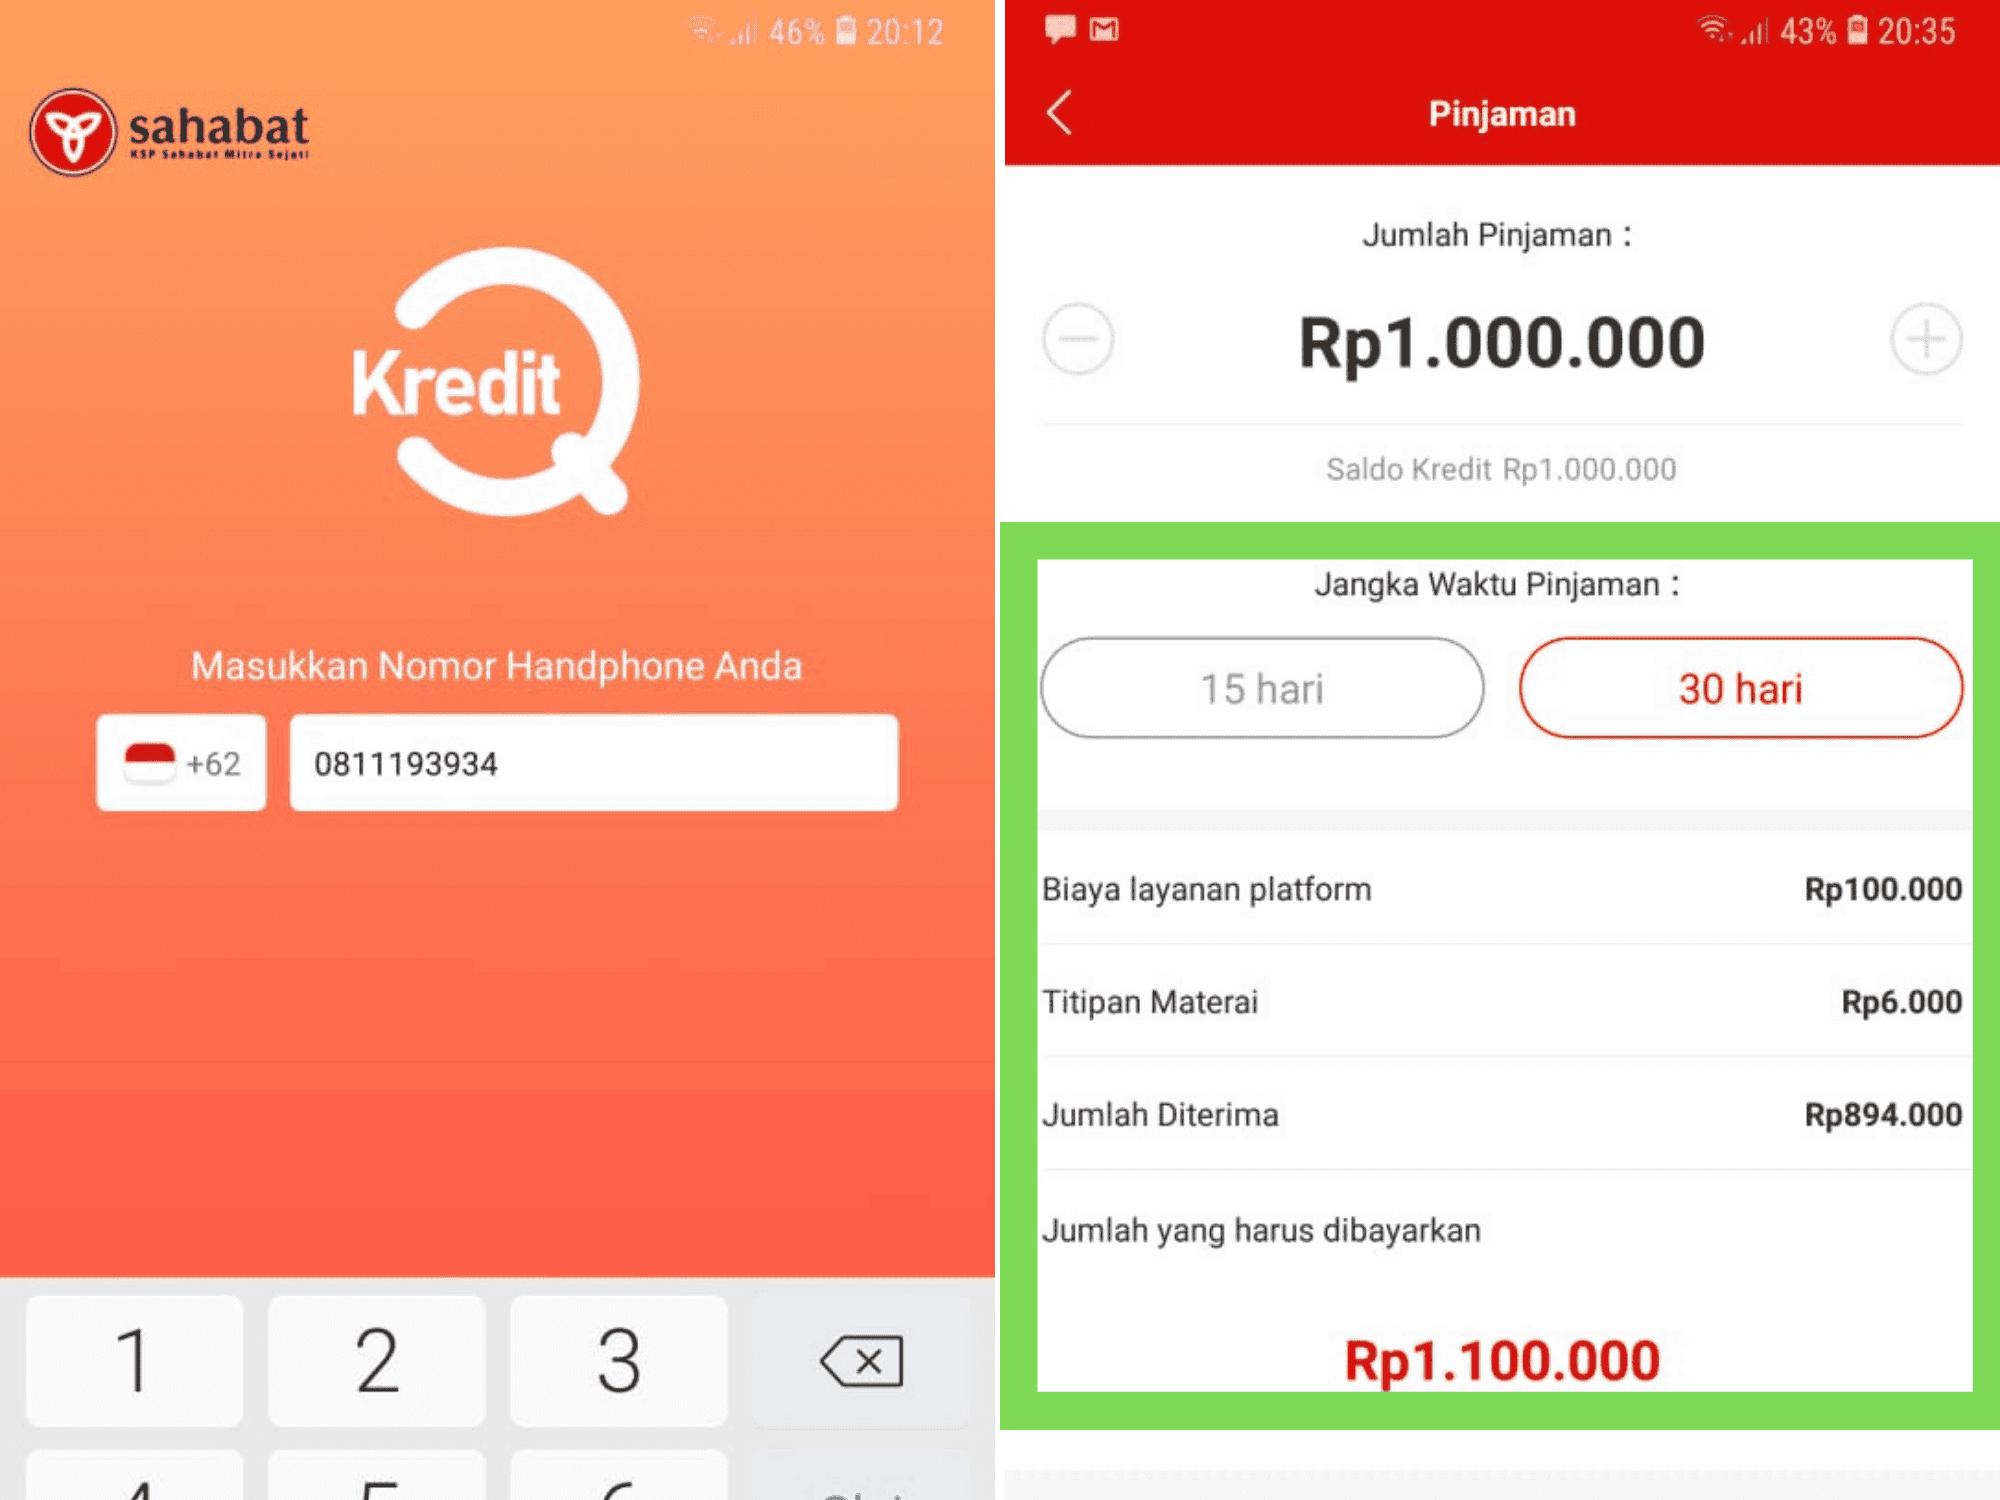 KreditQ Pinjaman Koperasi Online Dana Tunai Tanpa Jaminan